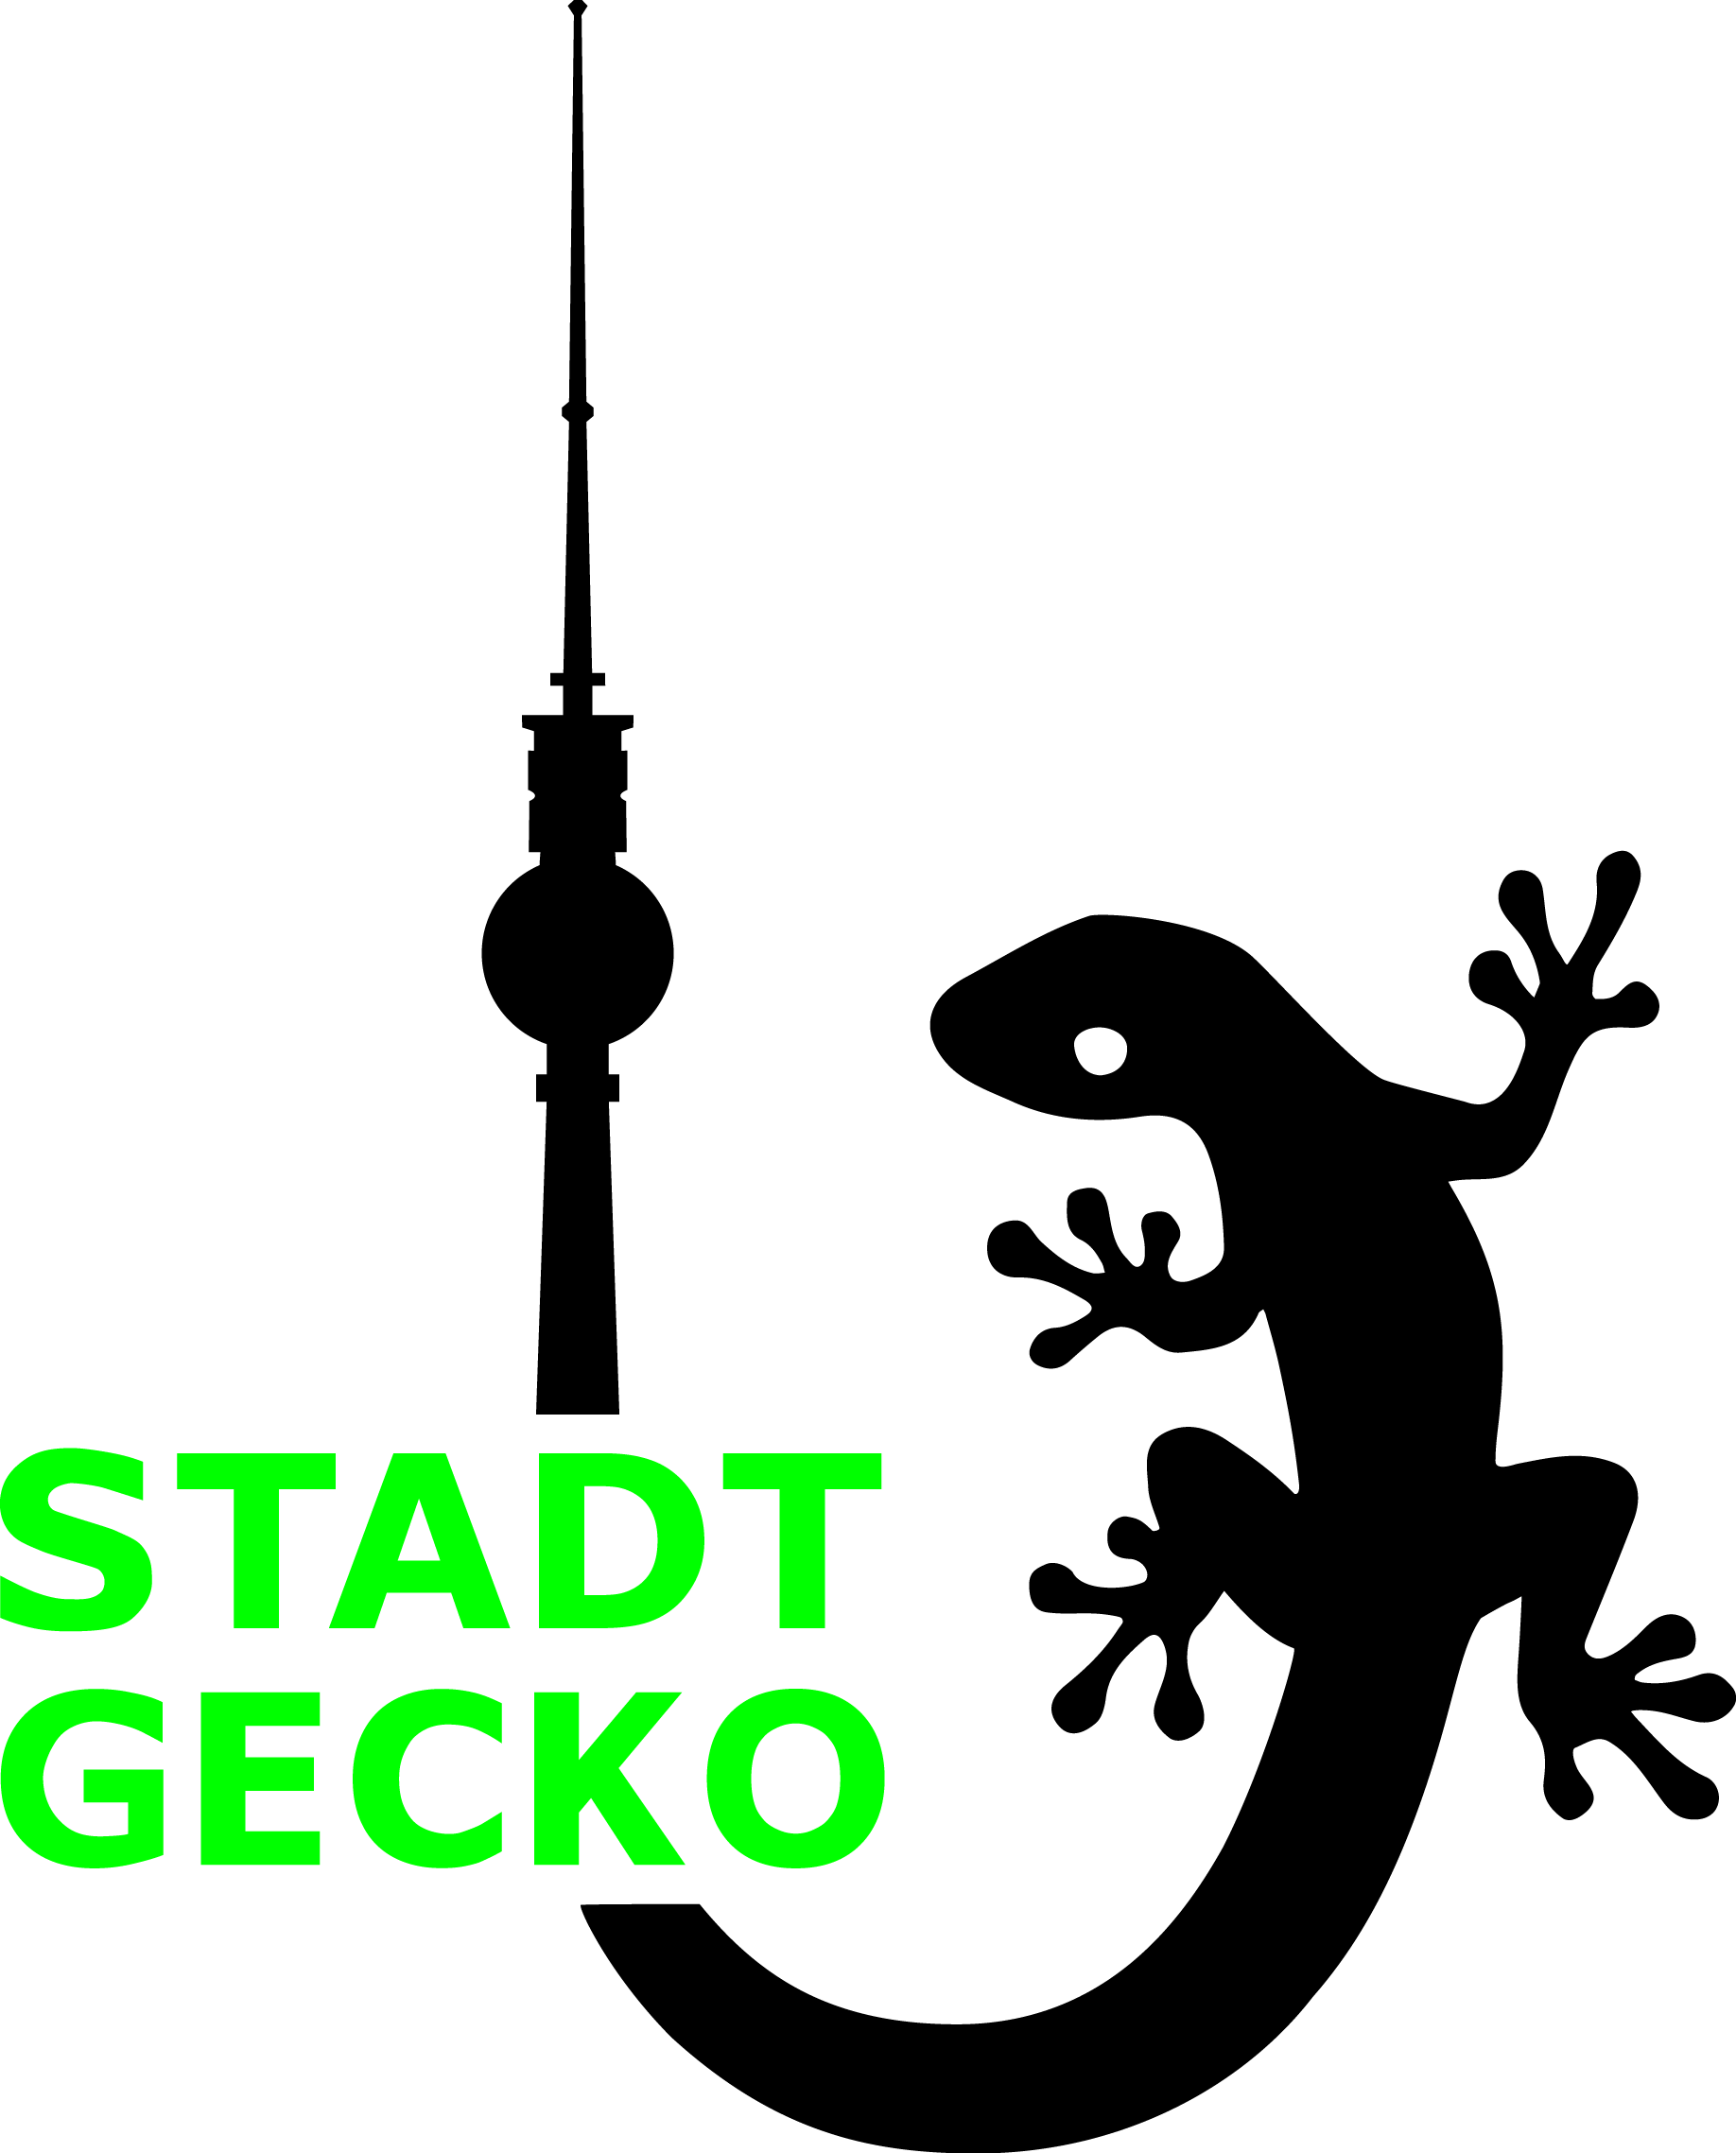 STADTGECKO